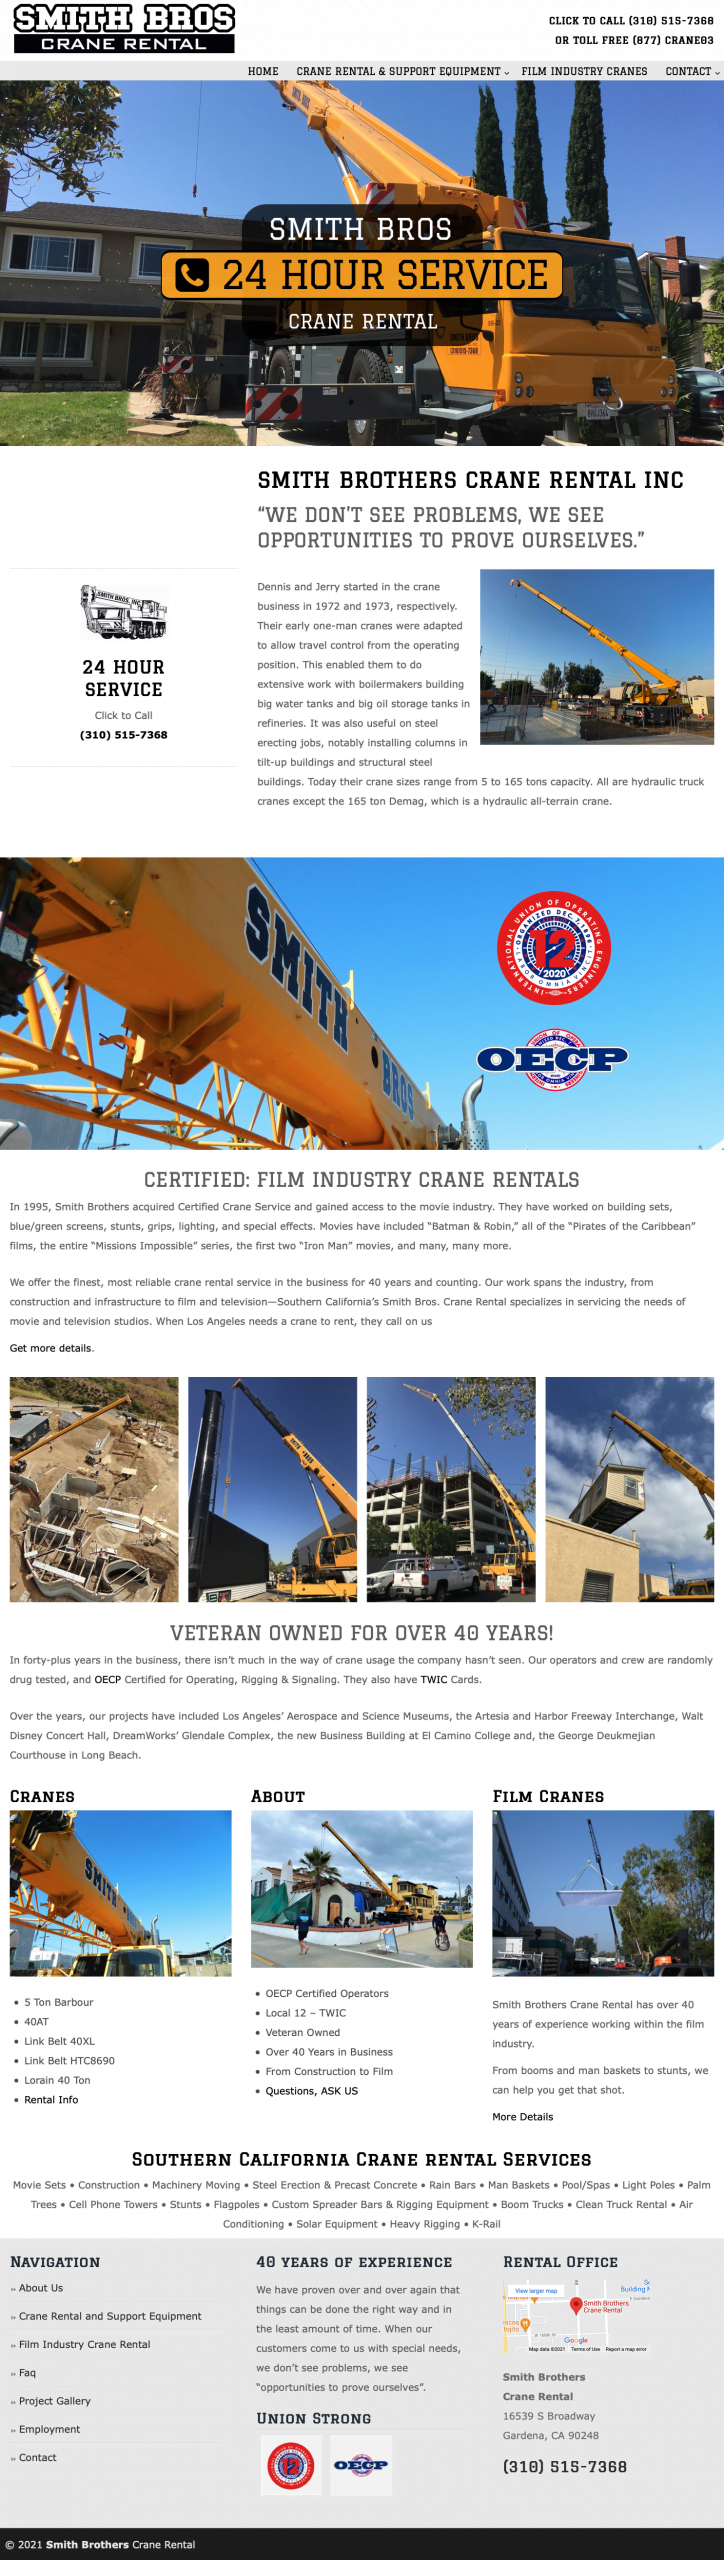 Smith Brothers Crane website